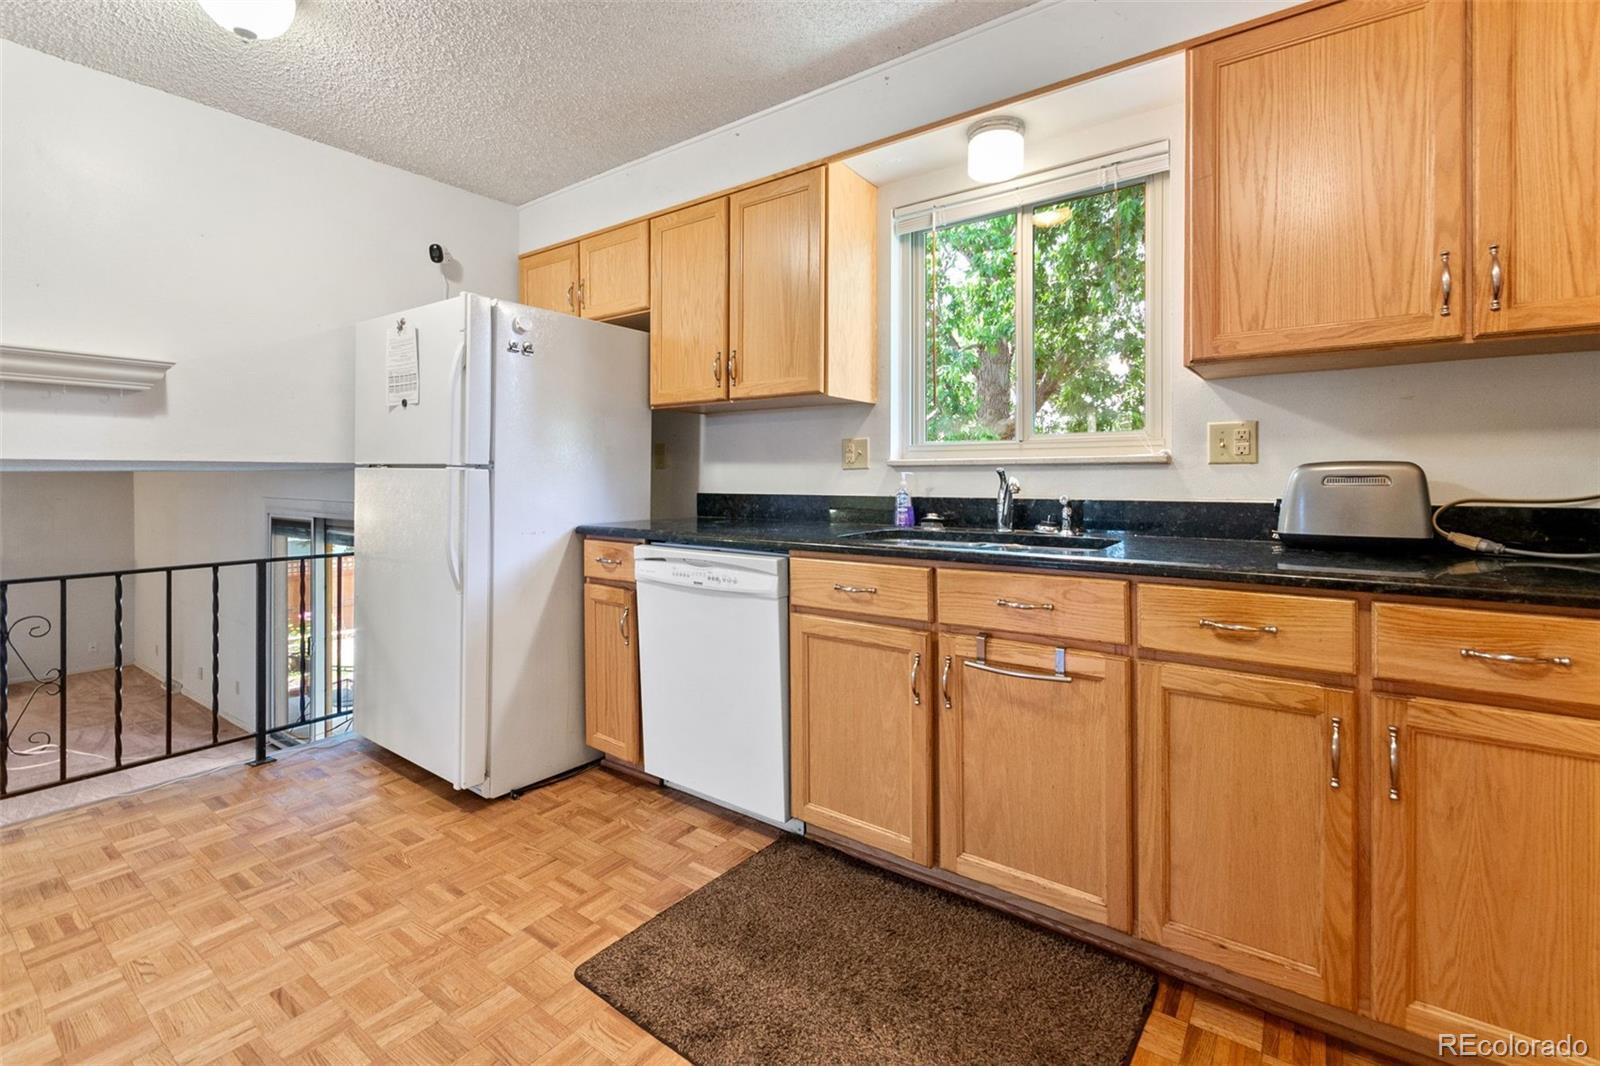 MLS# 7770404 - 13 - 2355 S Hoyt Street, Lakewood, CO 80227